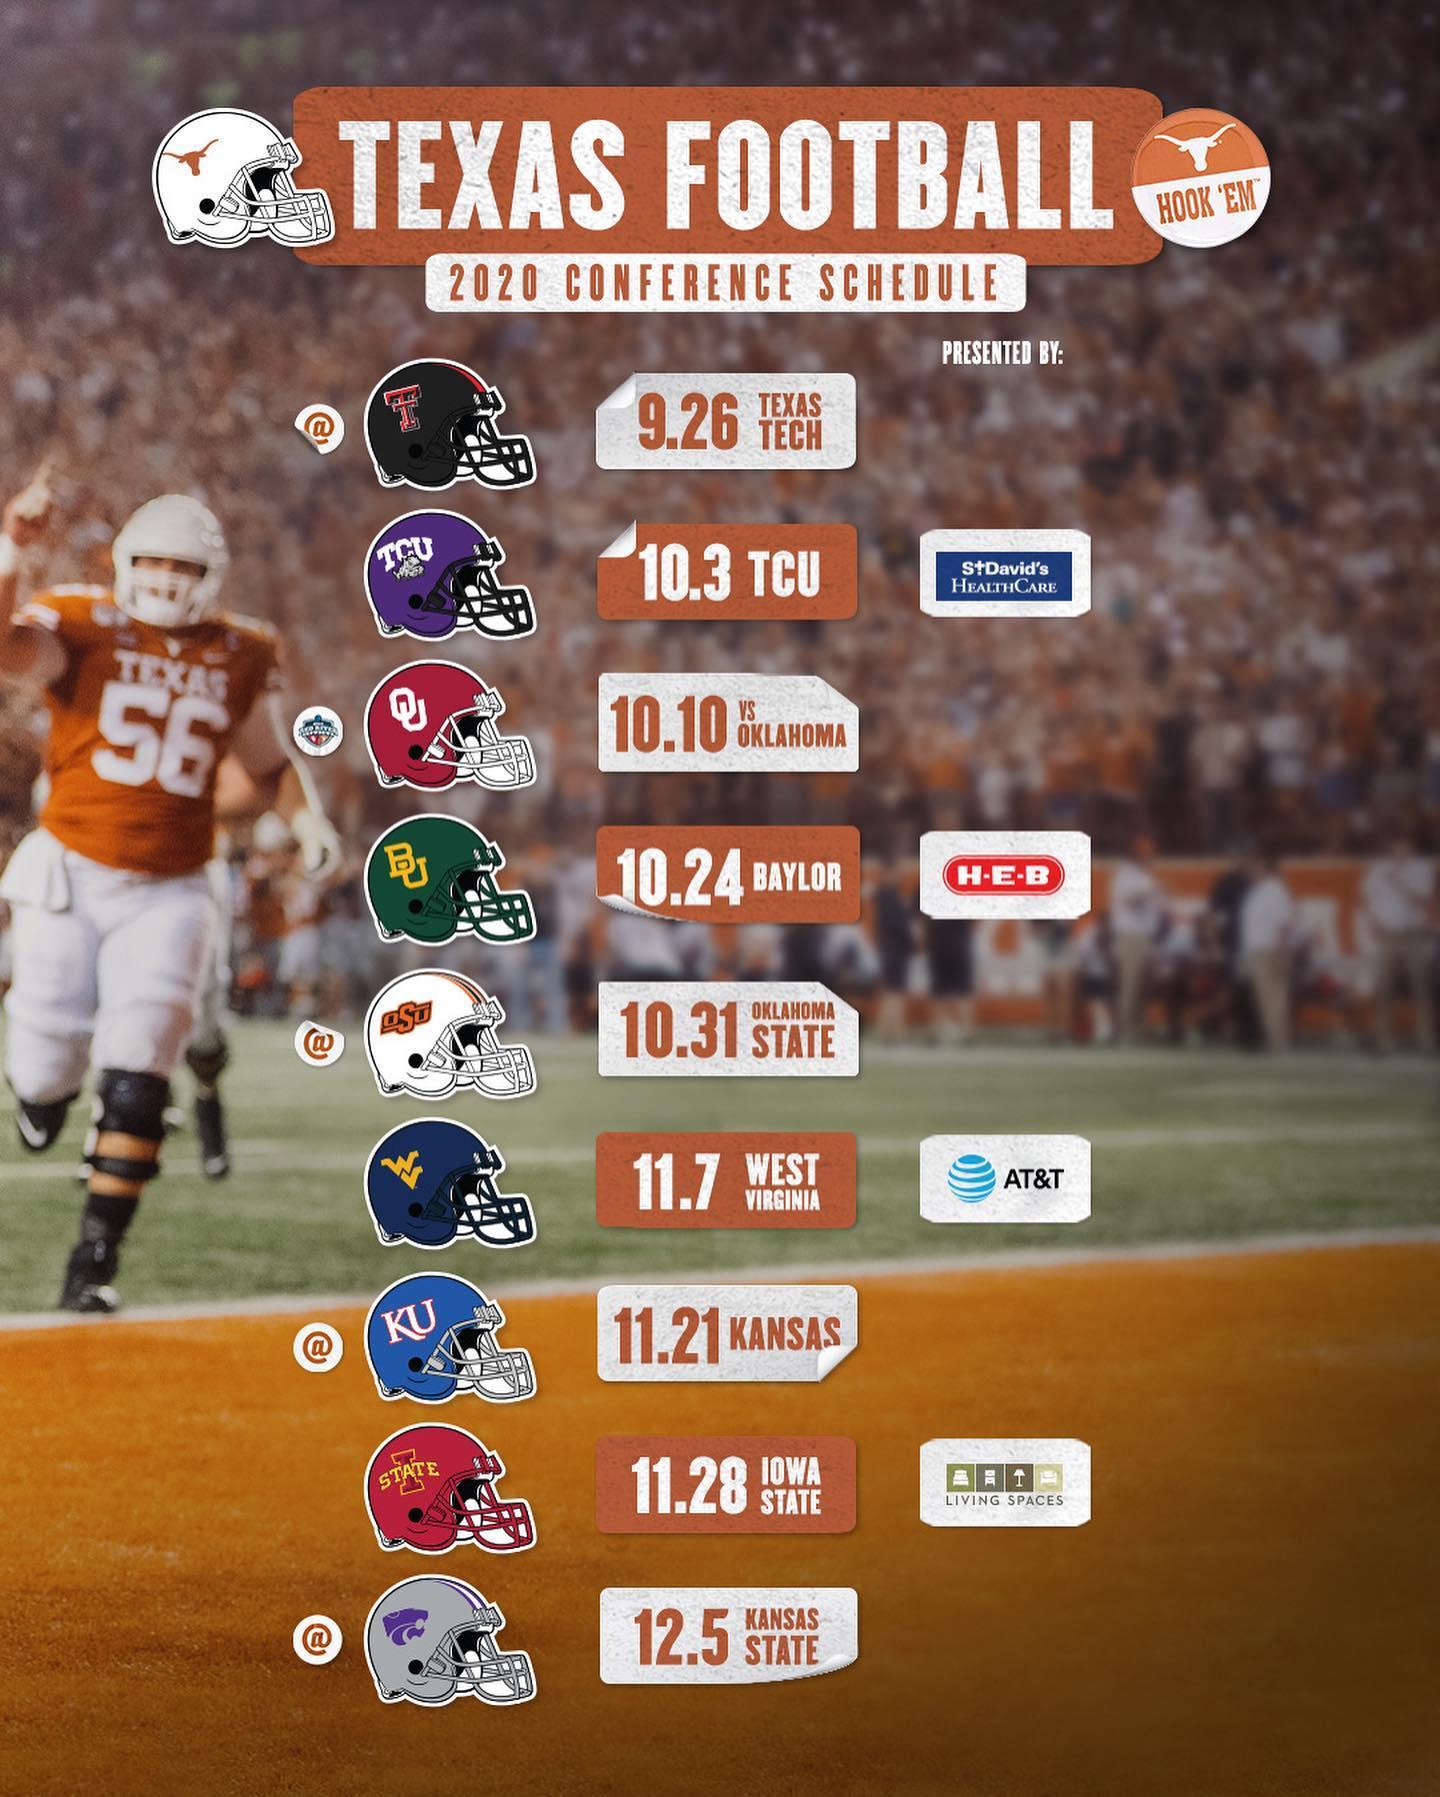 Big 12 Releases New 2020 Football Schedule!